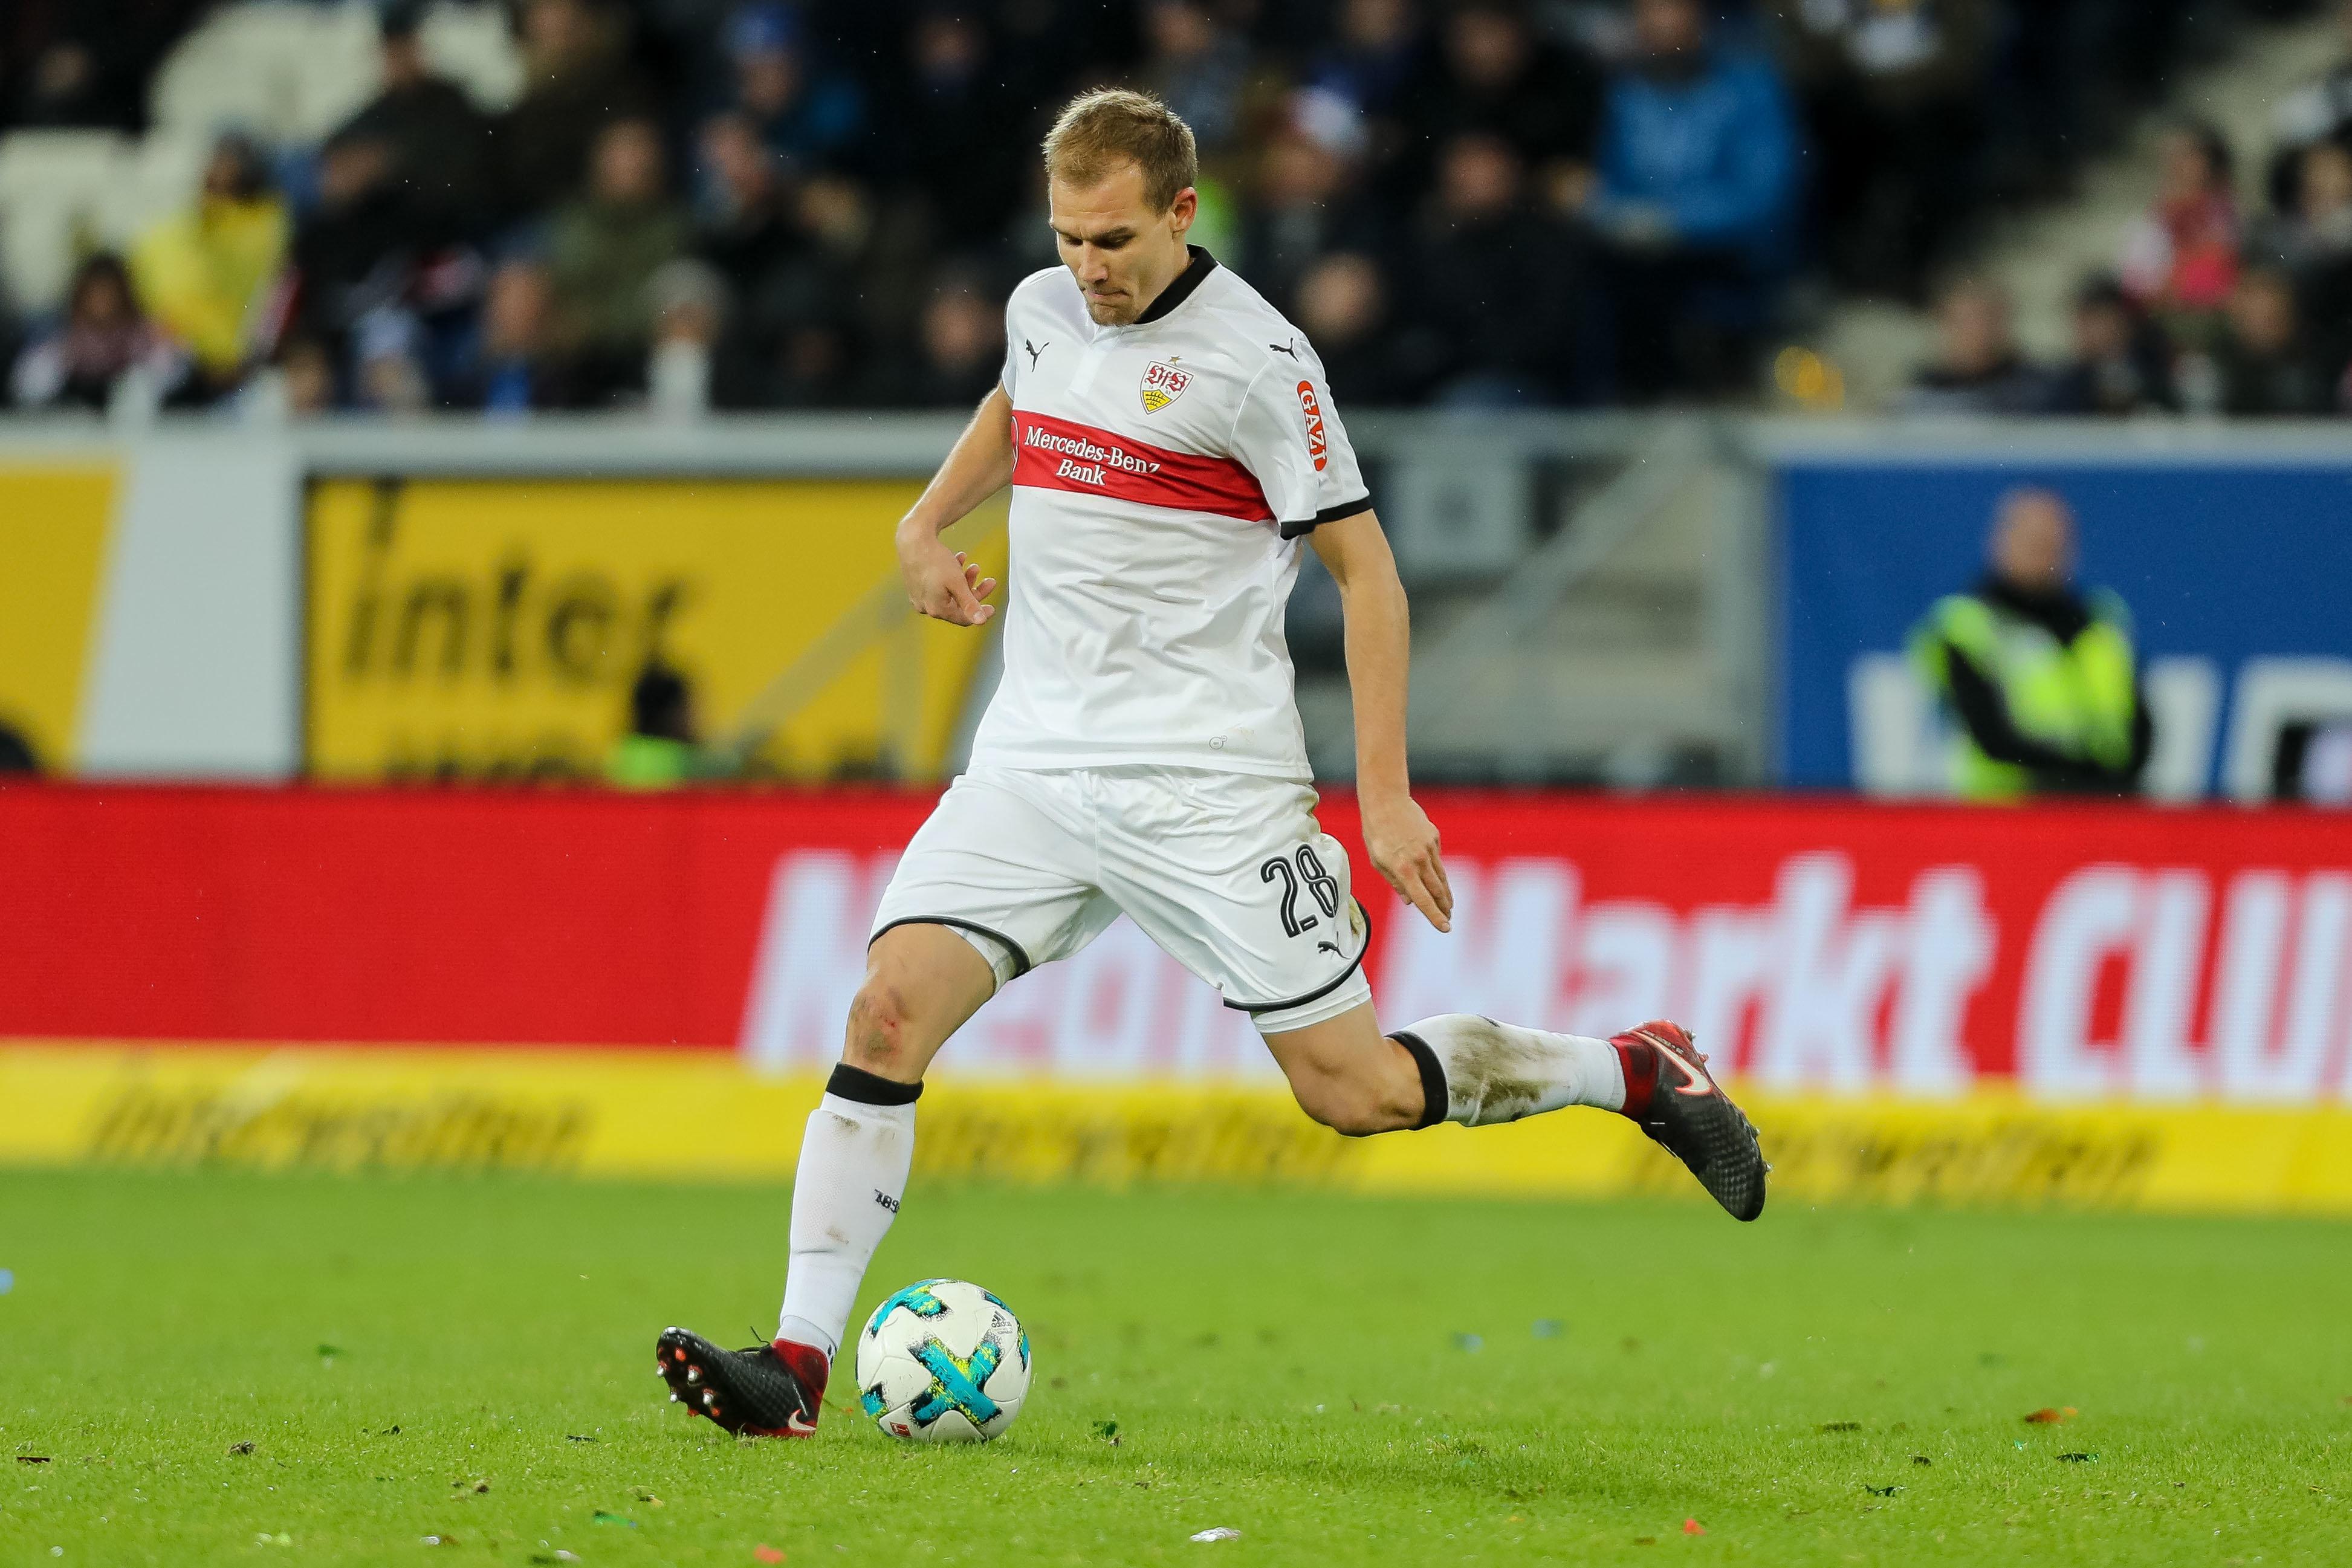 Stuttgart - Mönchengladbach im Live-Stream: Bundesliga online sehen, so